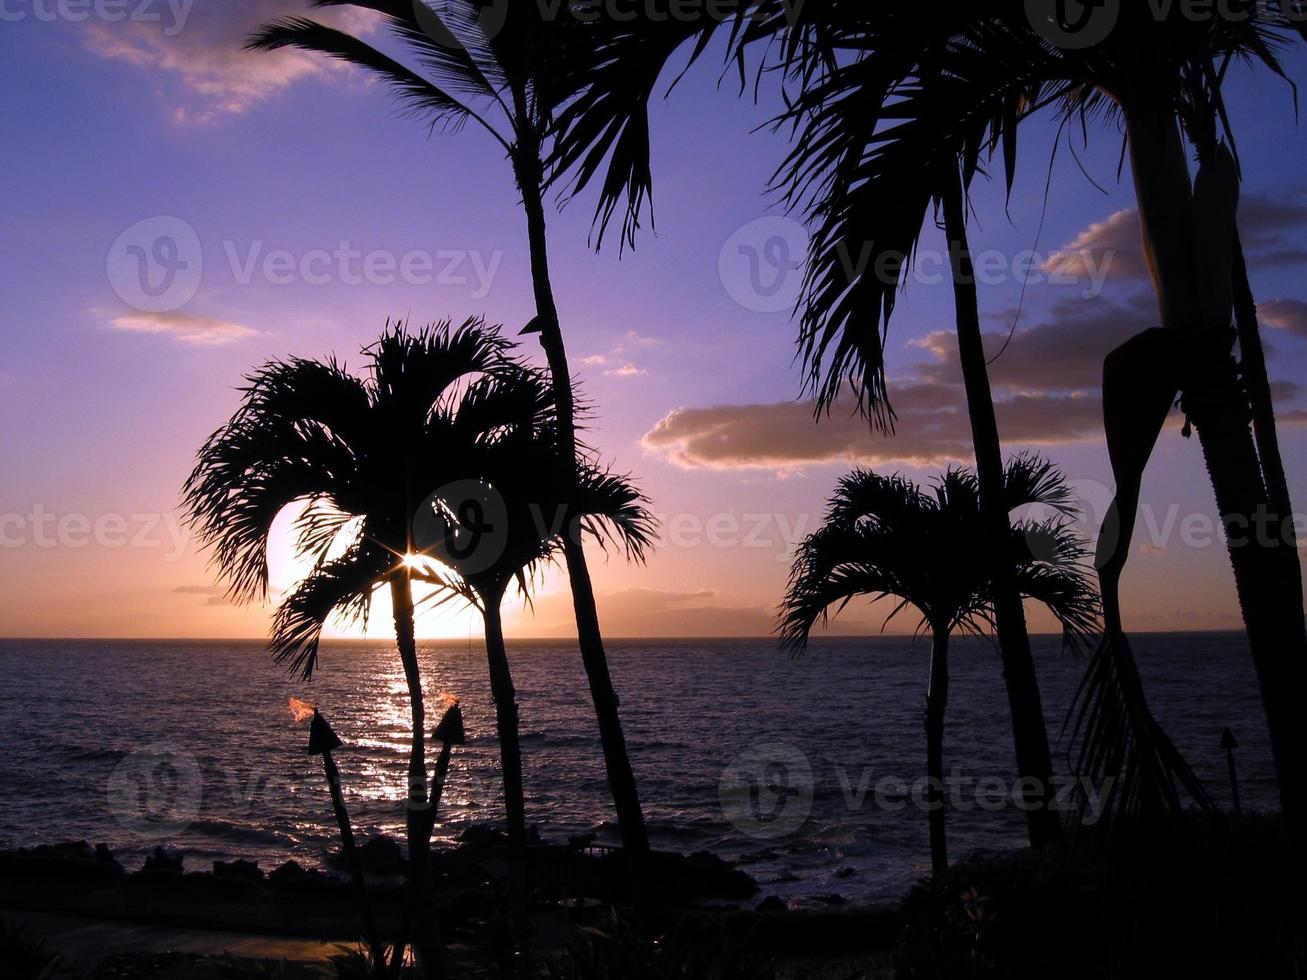 Coucher de soleil torche hawaïenne tiki torche, maui photo